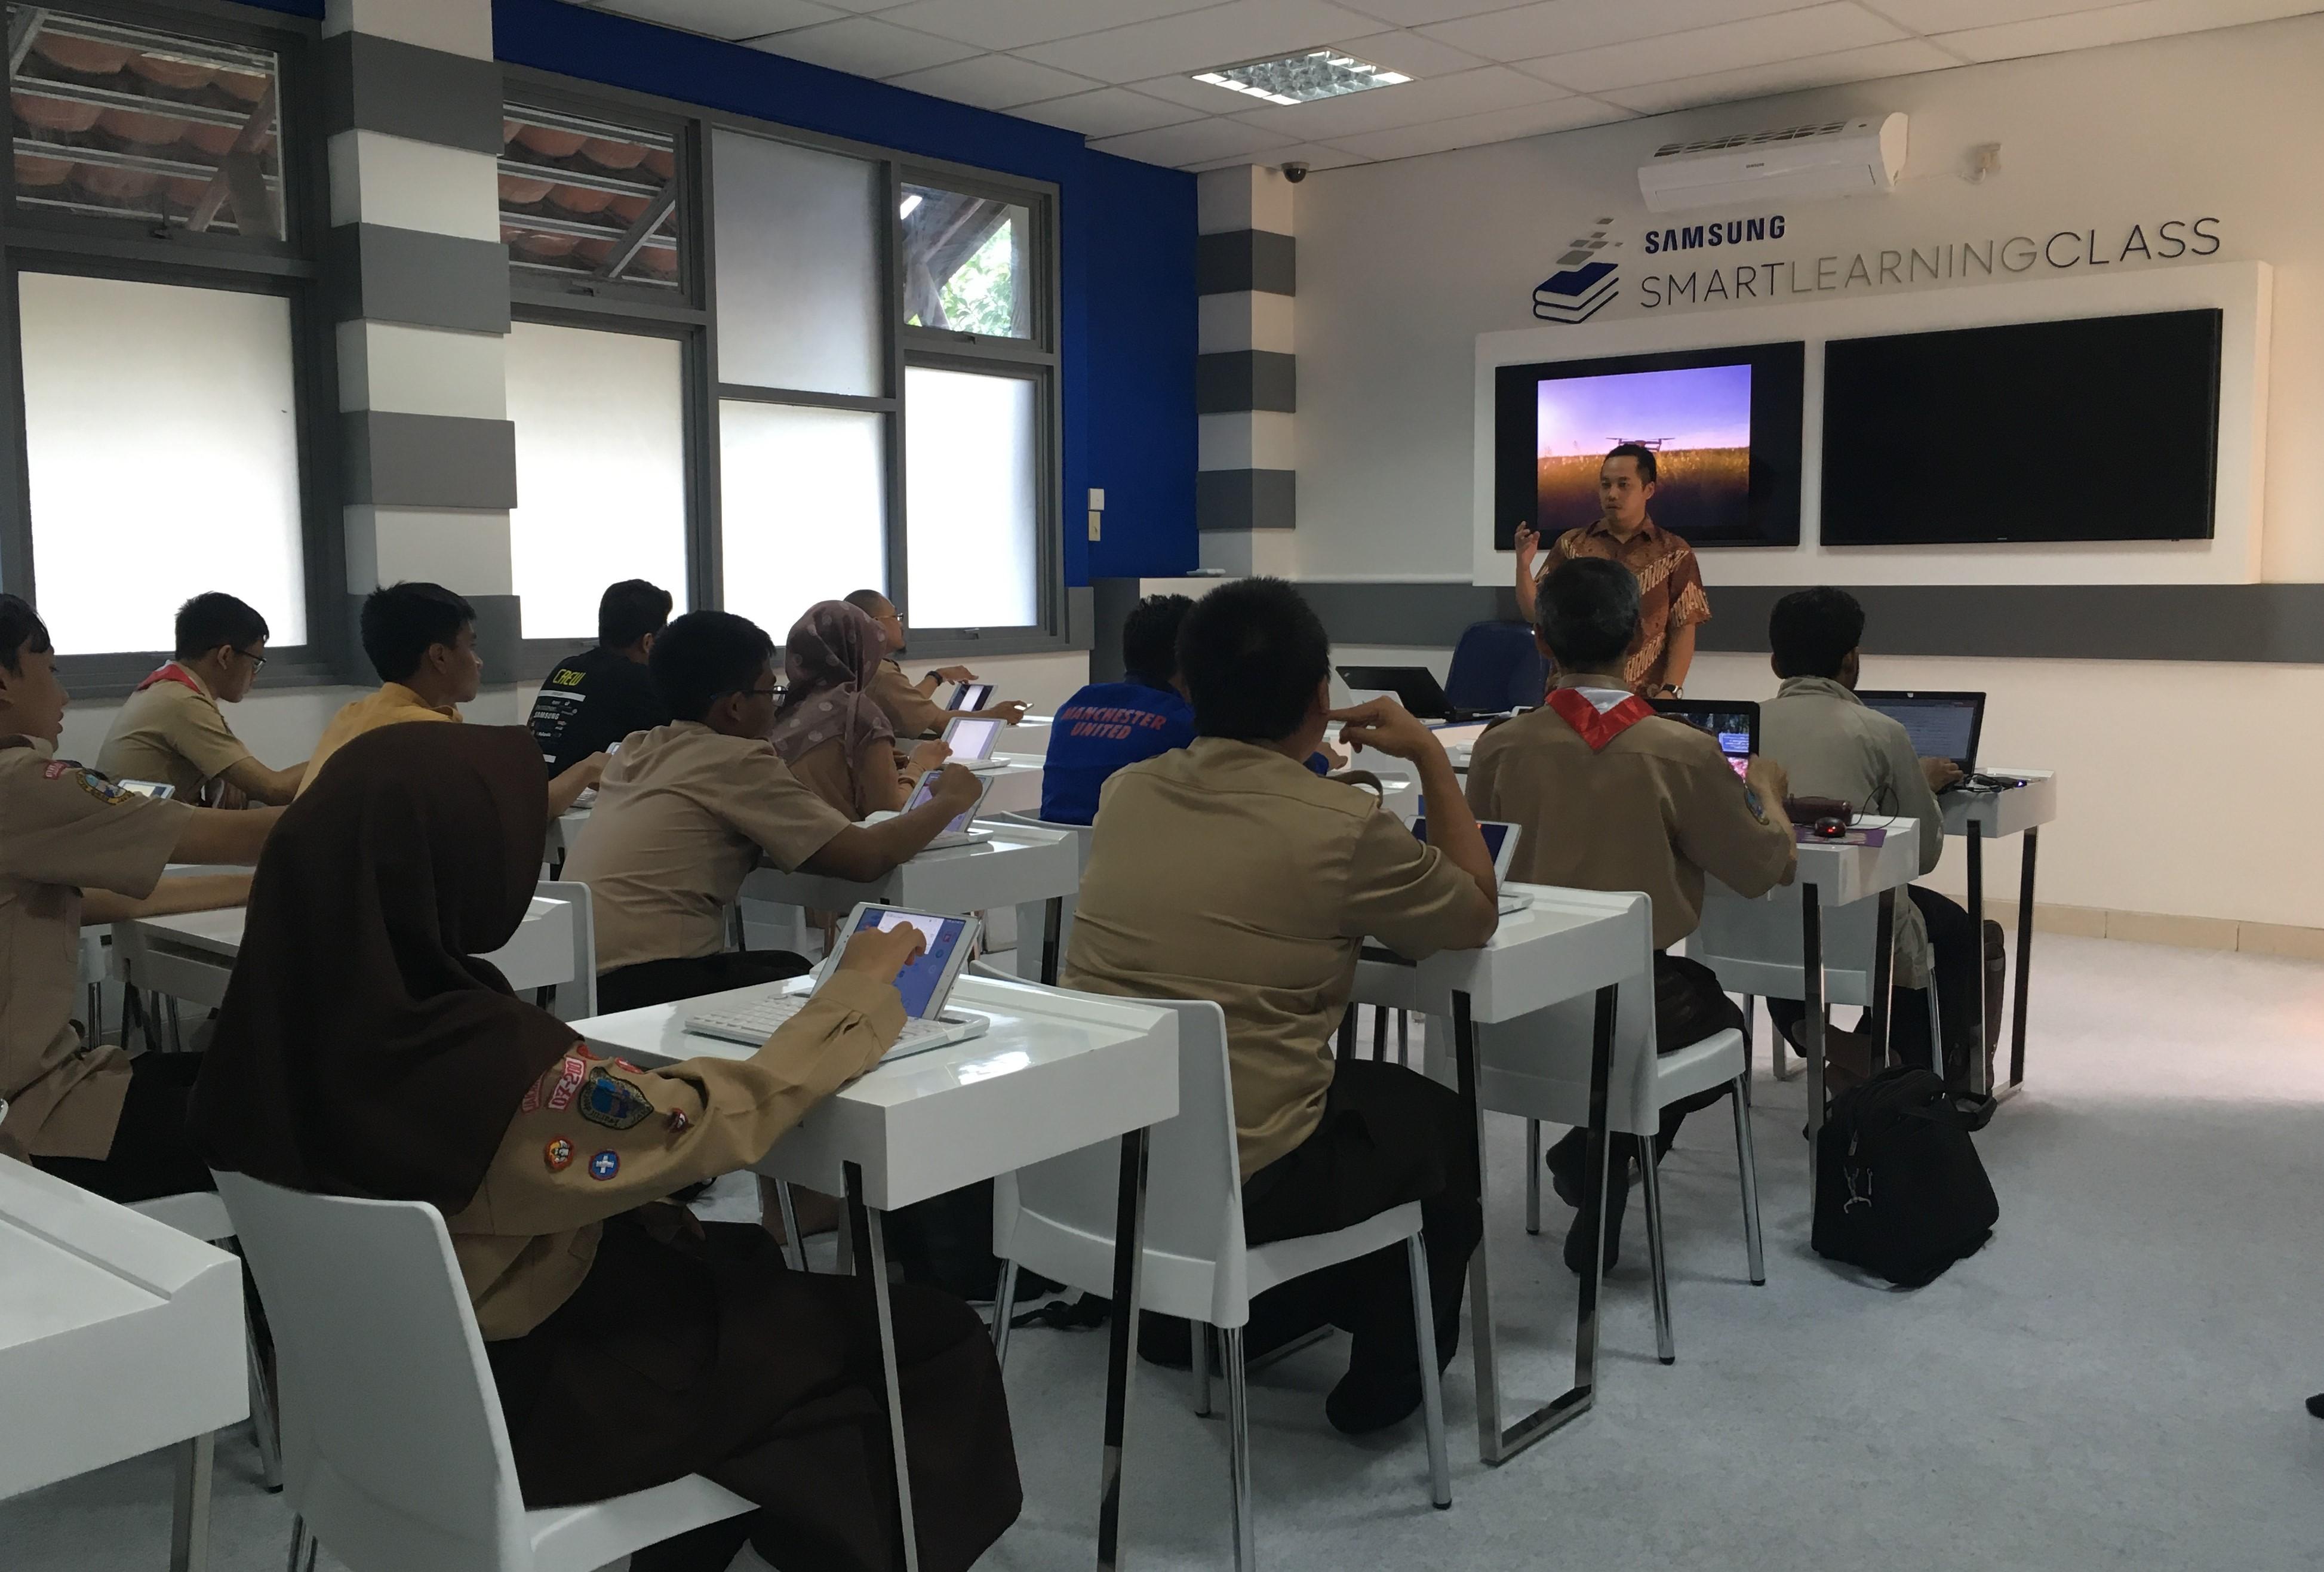 Samsung Smart Learning Class Dorong Penggunaan Teknologi